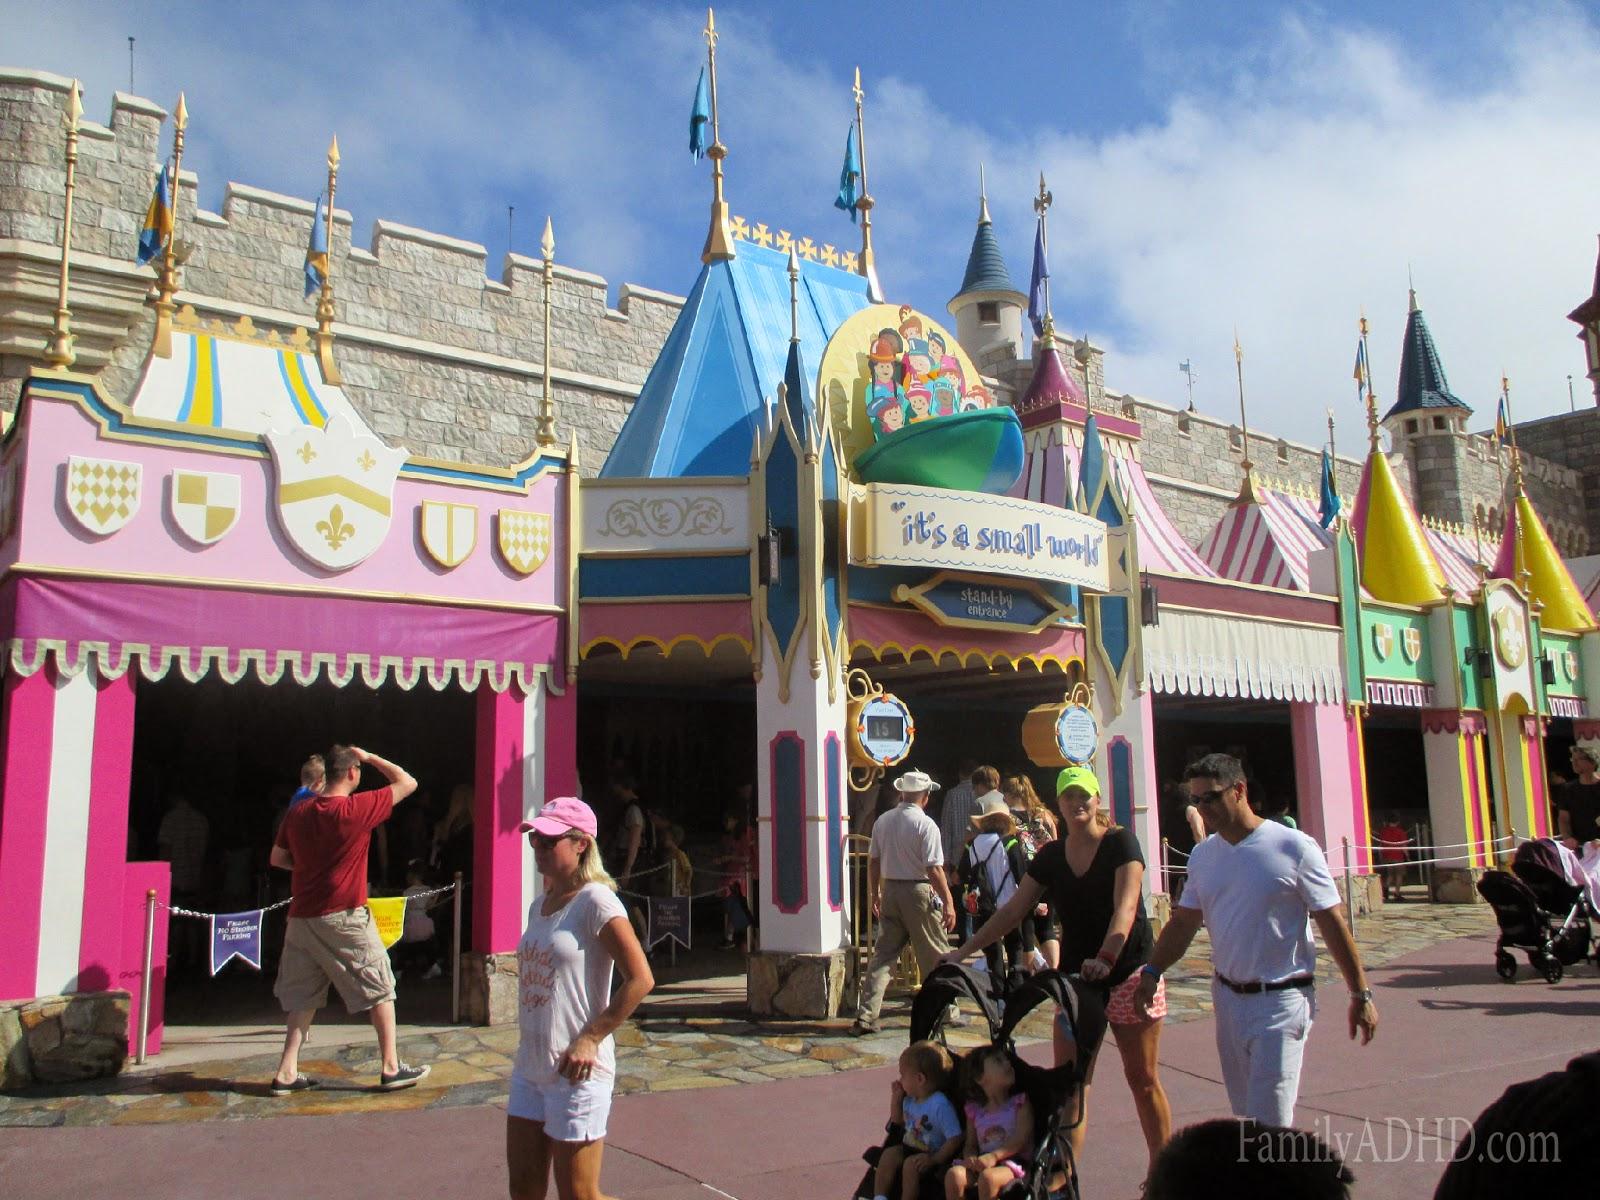 orlando family travel guide 2015 fantasyland it's a small world ride